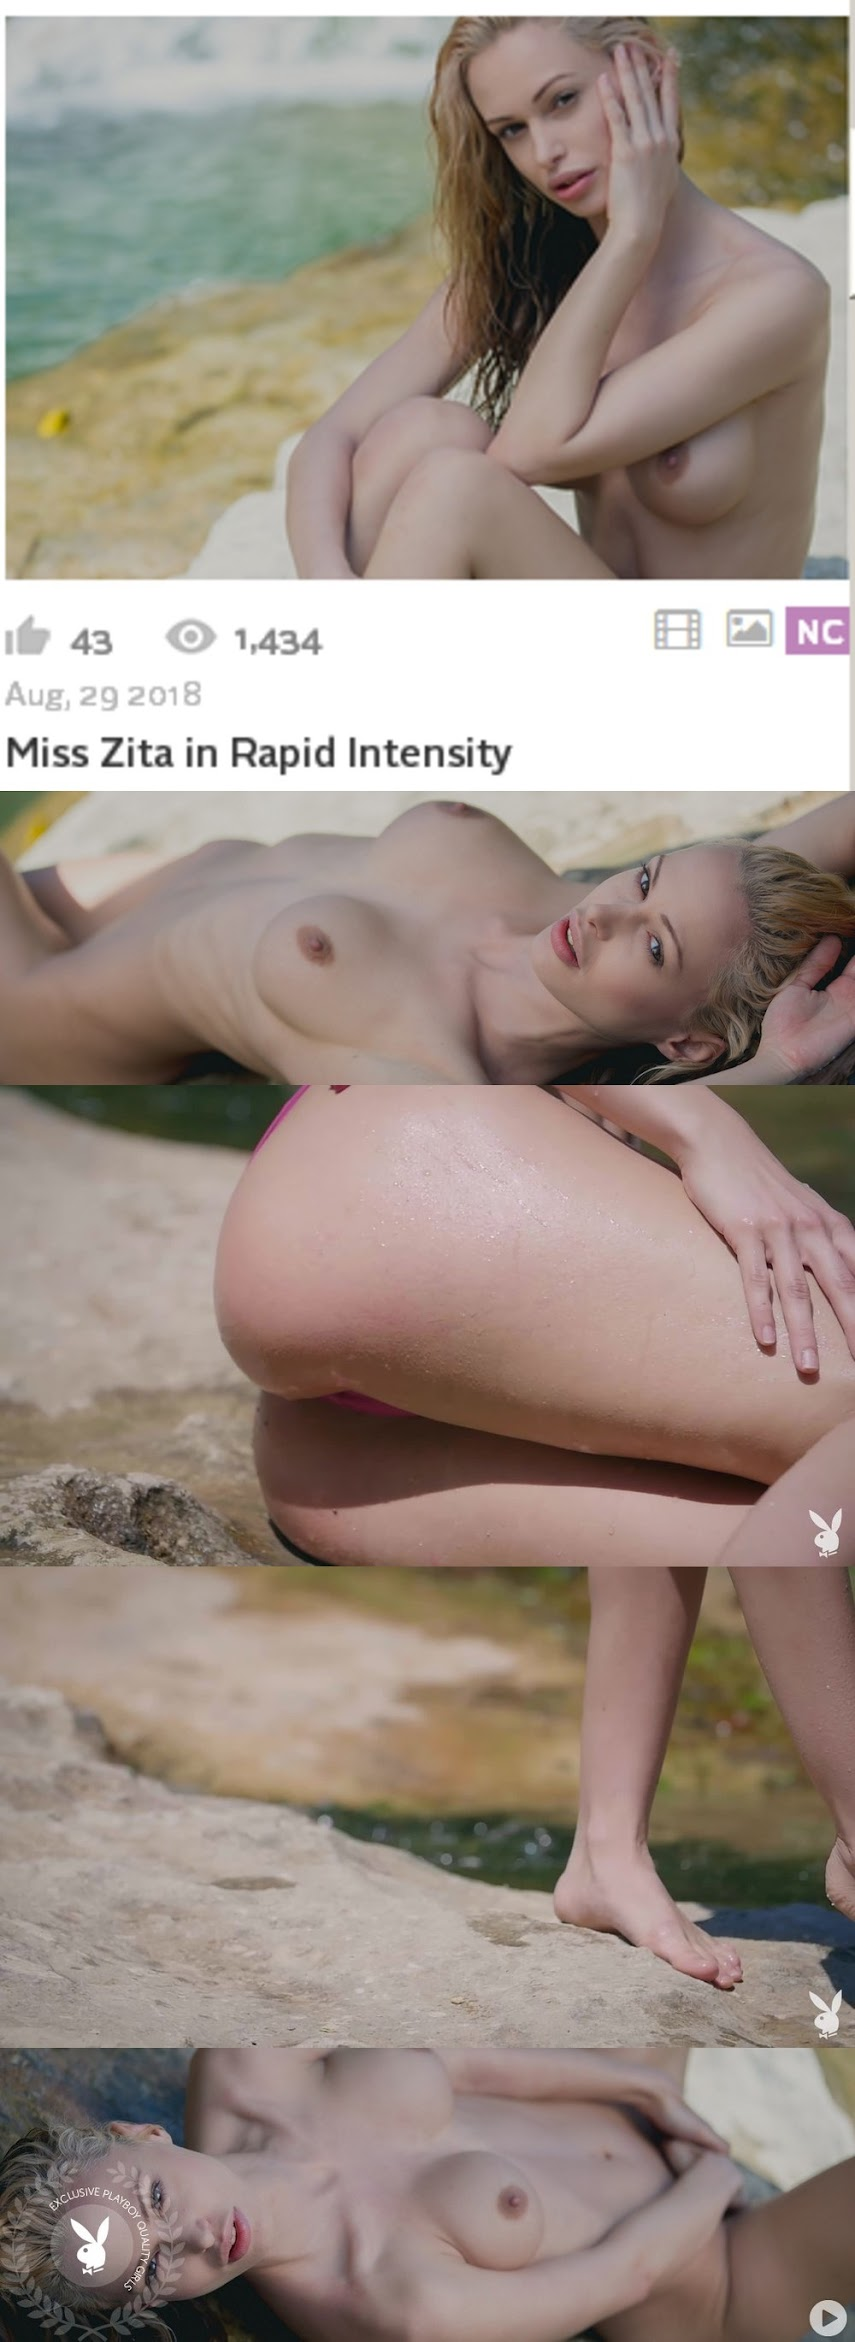 Playboy PlayboyPlus2018-08-29 Miss Zita in Rapid Intensity